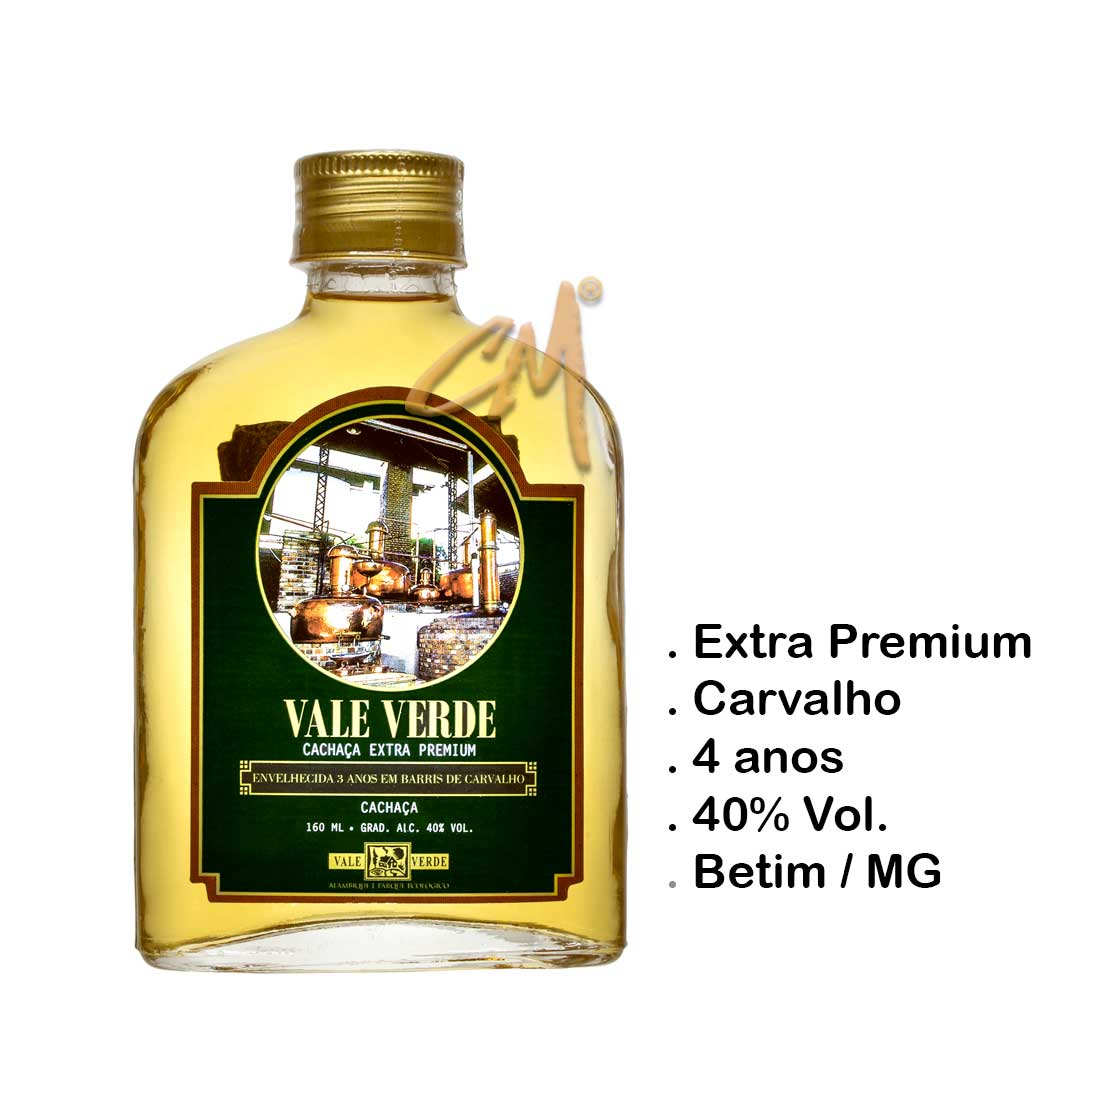 Cachaça Vale Verde Extra Premium 160 ml (Betim - MG)